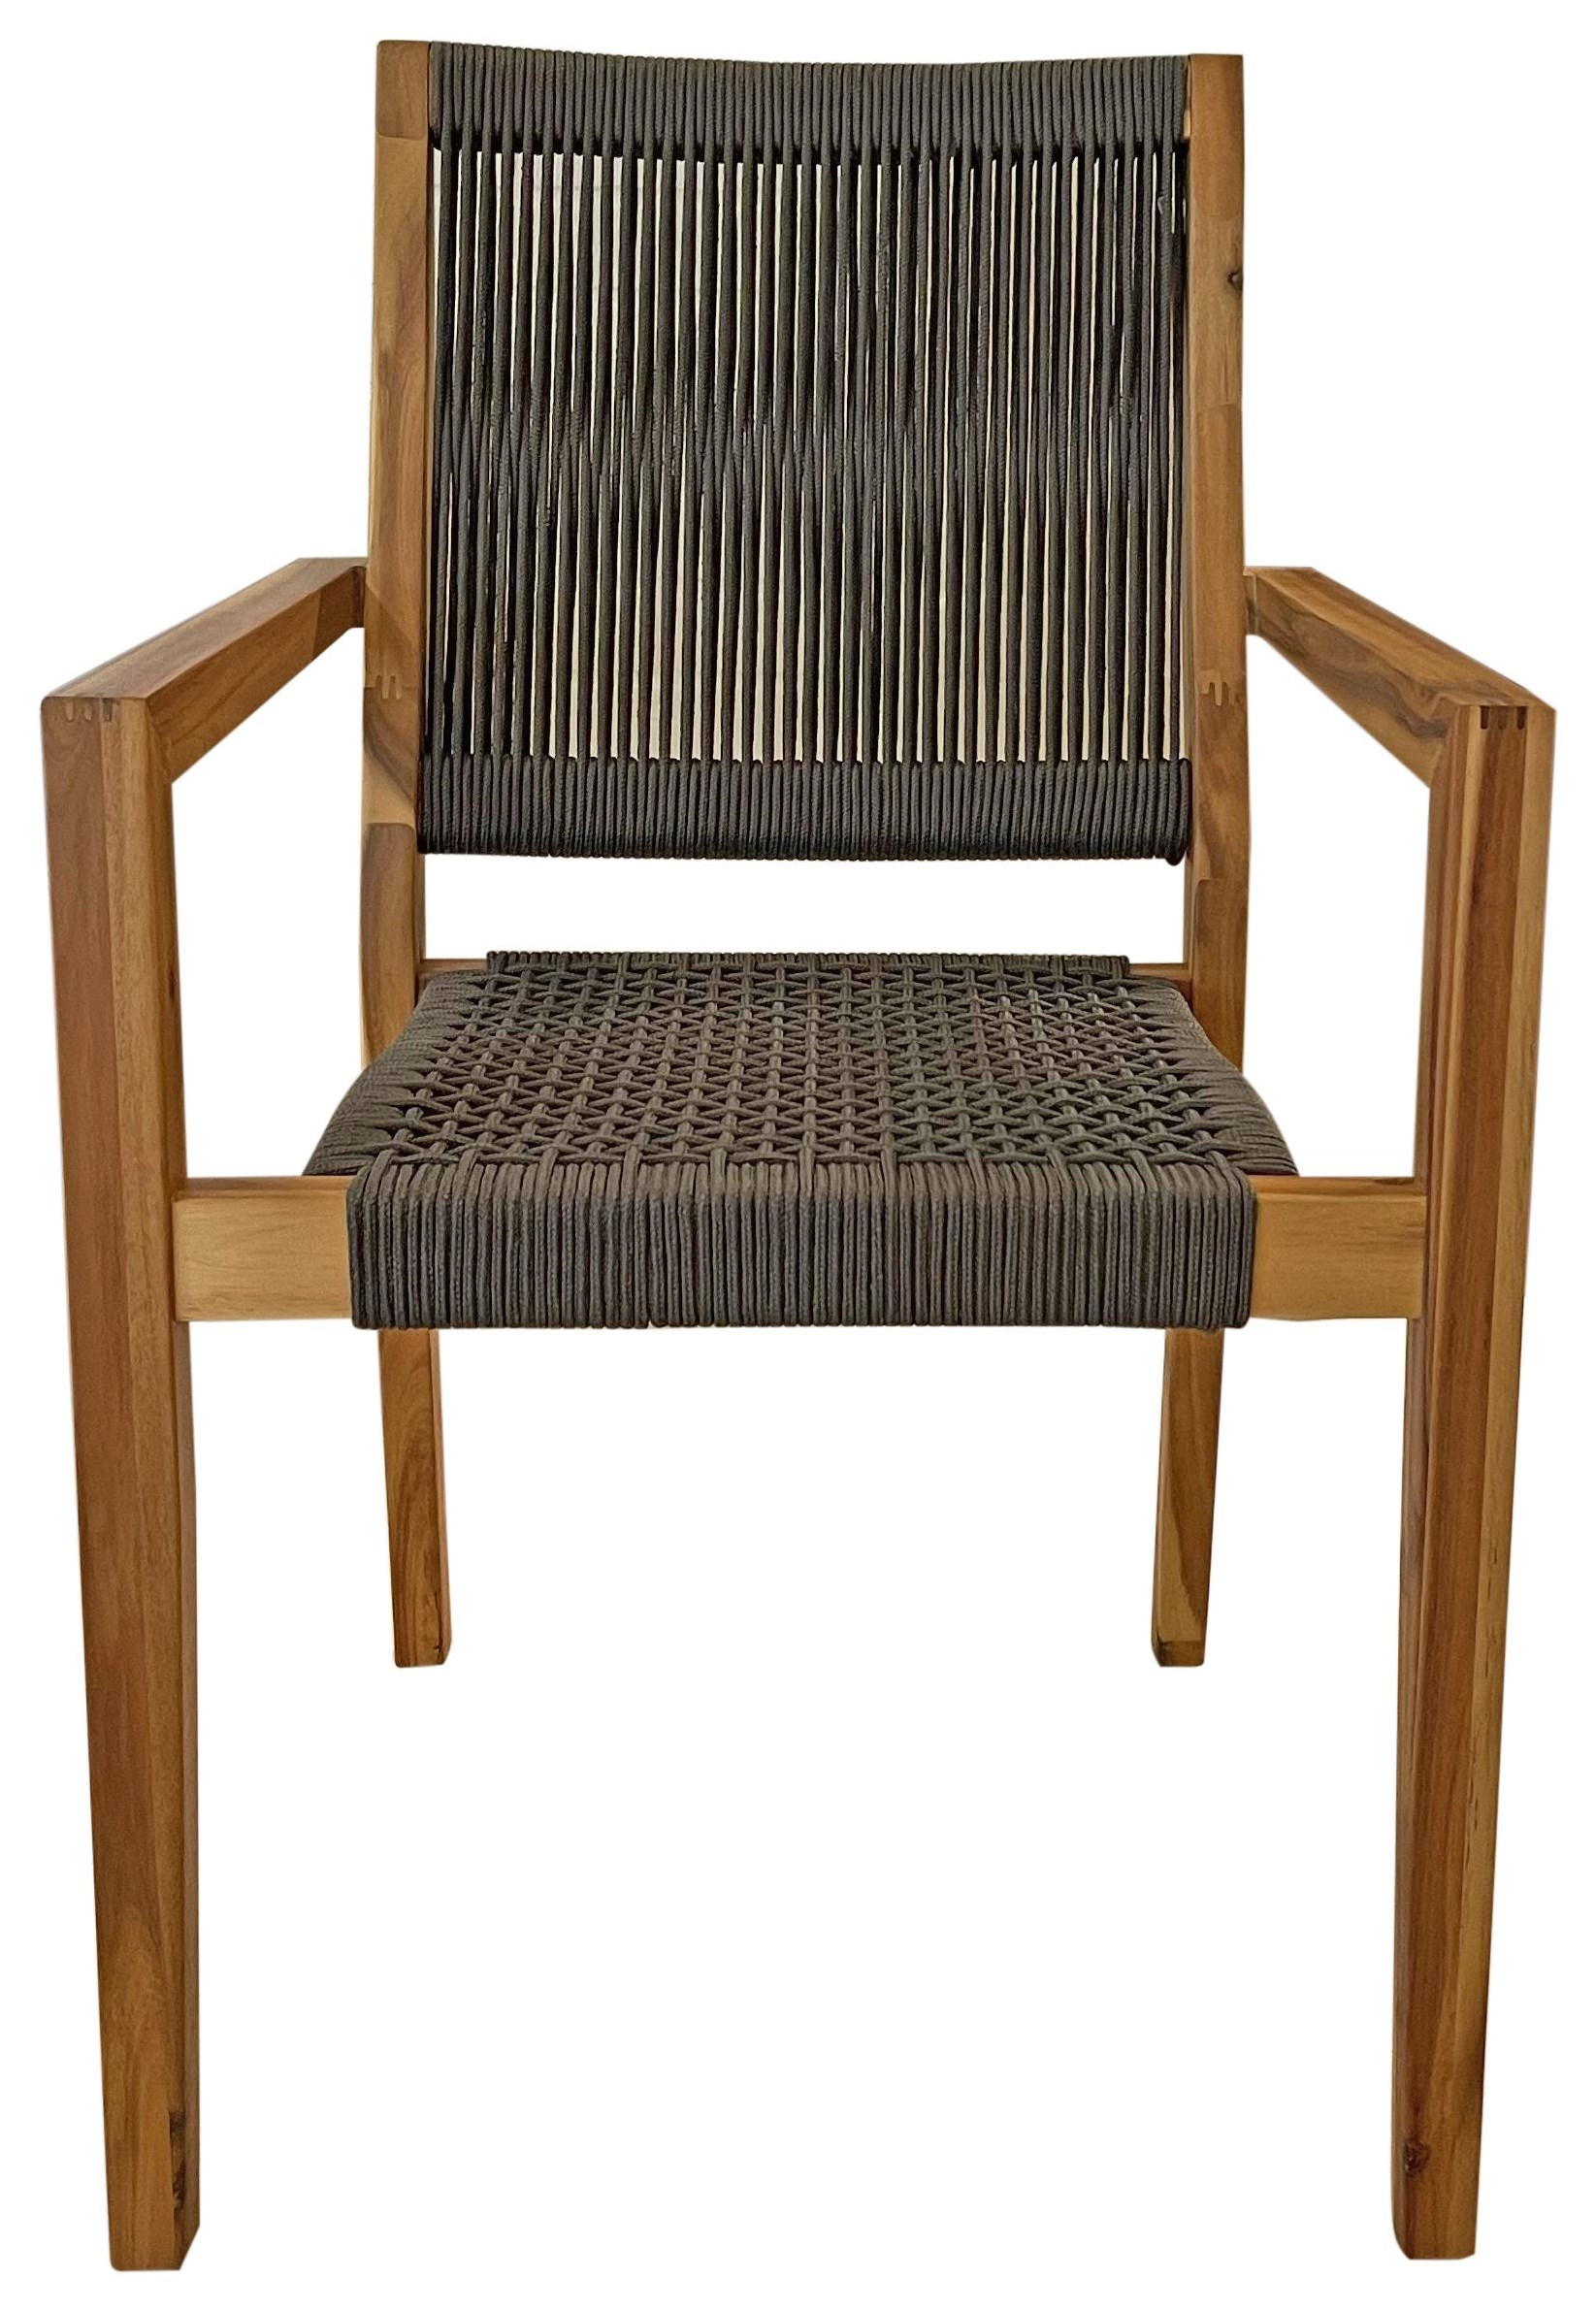 Sienna Dining Chair by Design Evolution at HomeWorld Furniture